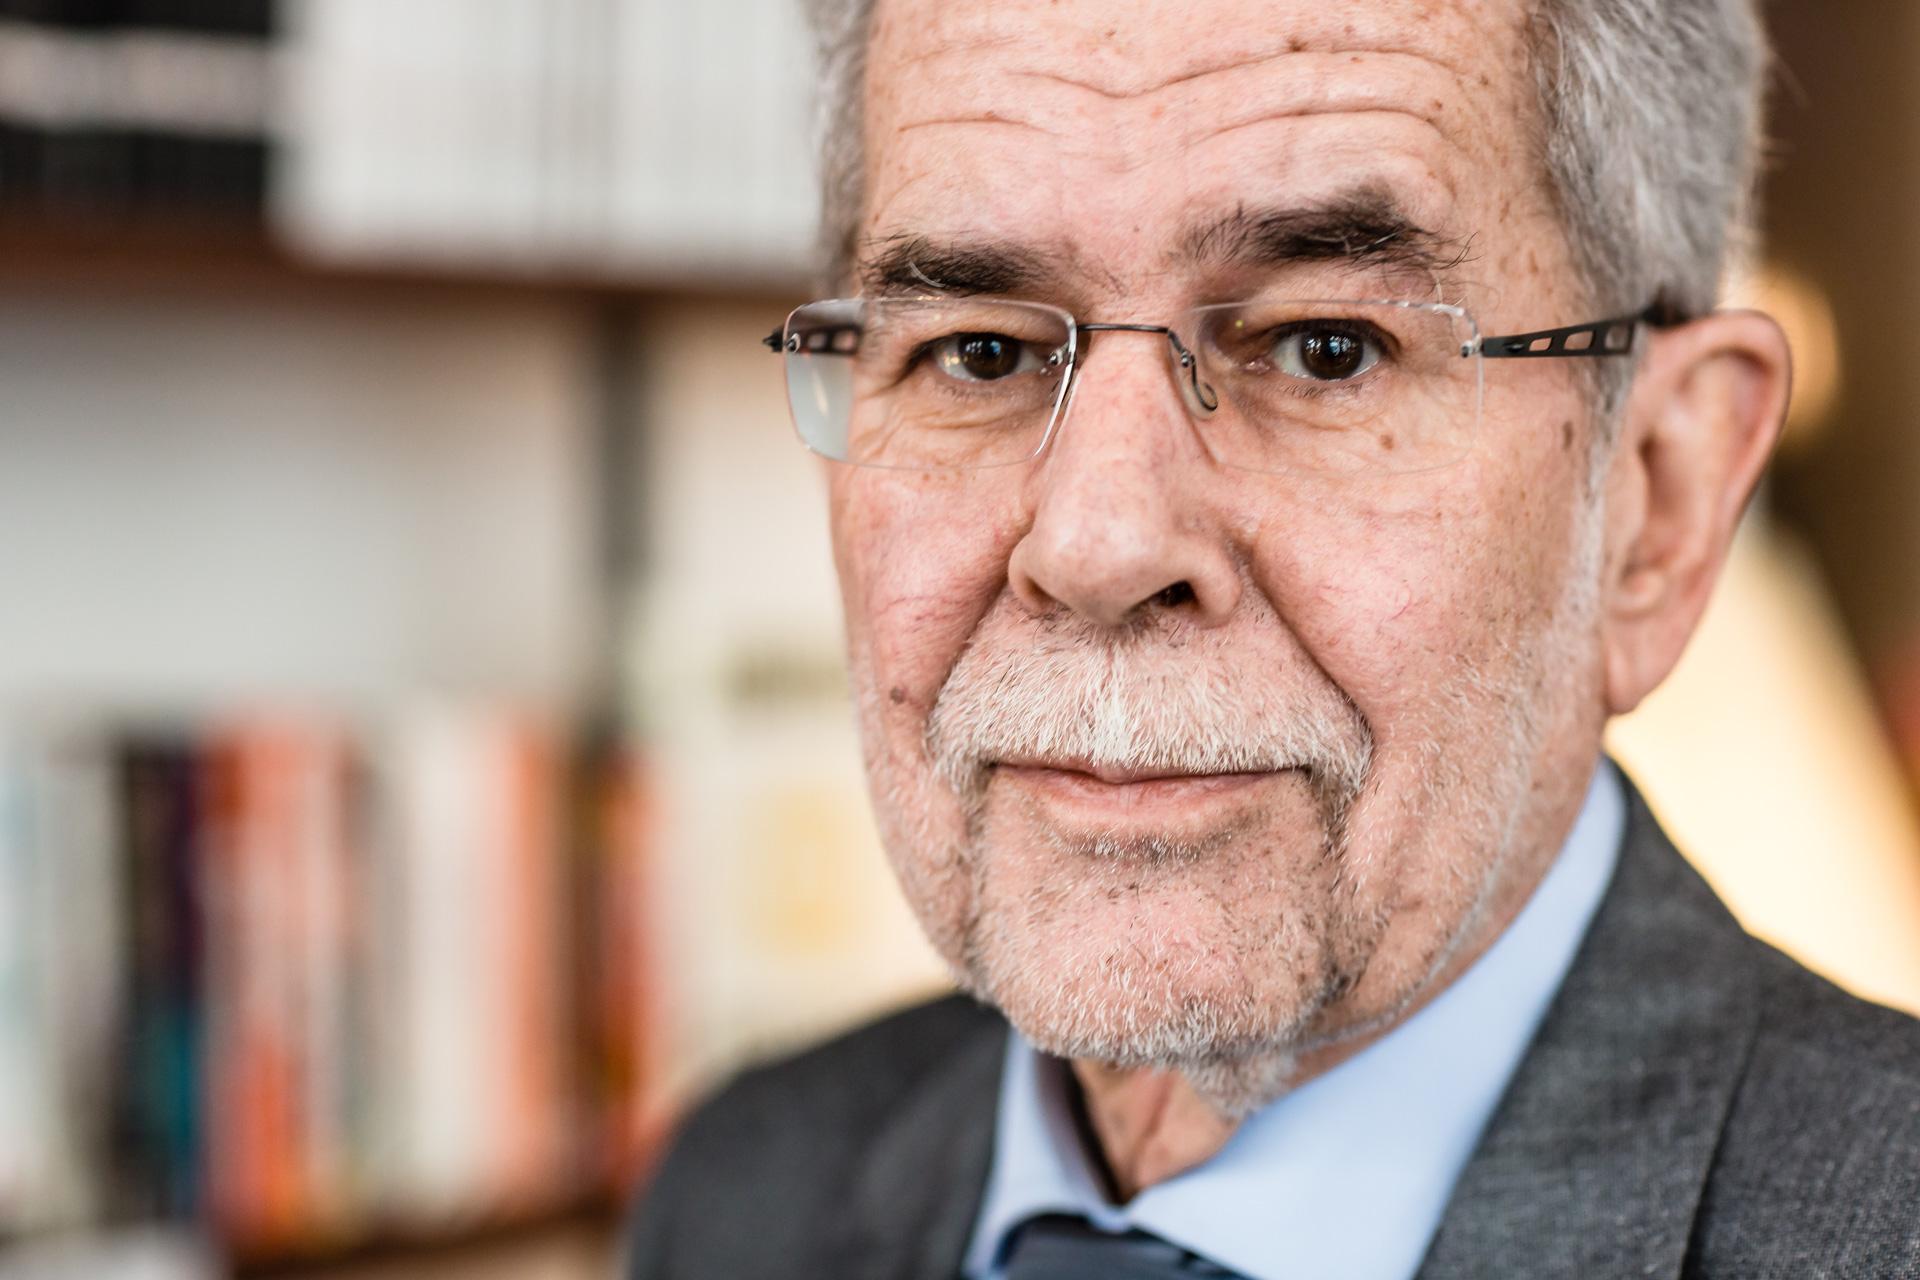 Analista internacional baja la euforia tras derrota de la ultraderecha xenófoba en Austria